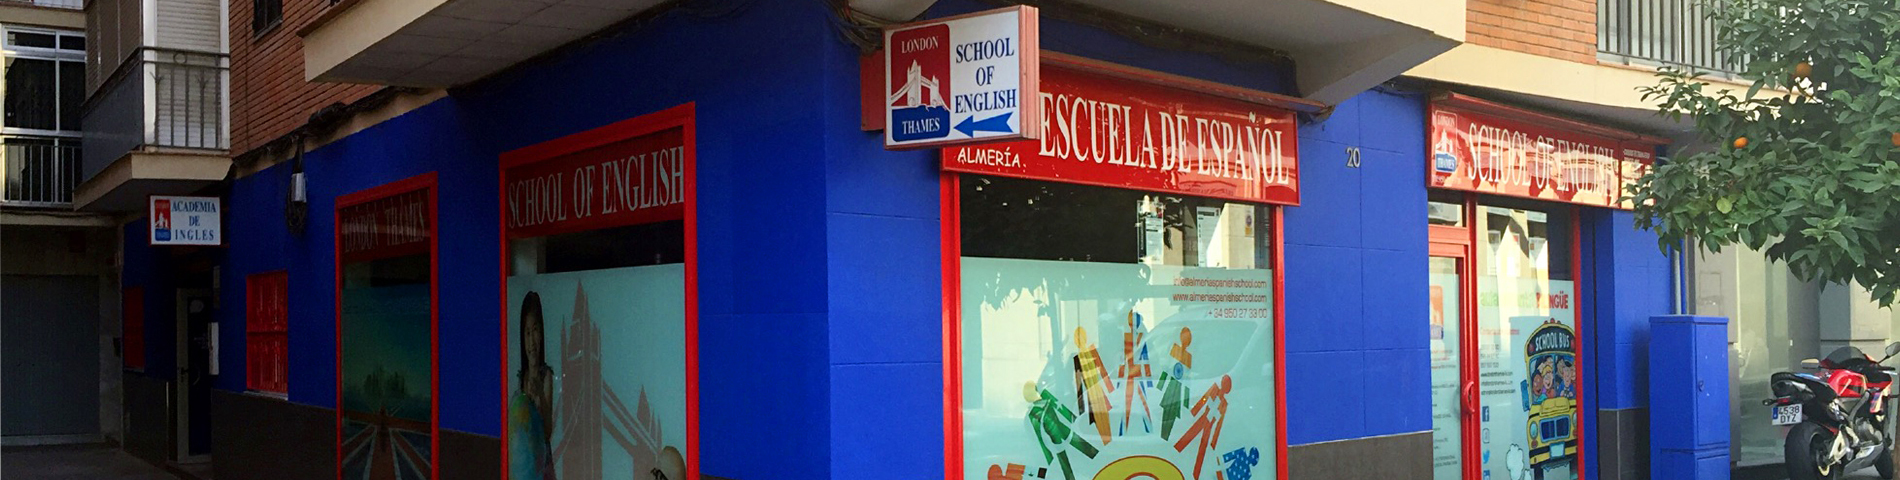 Almeria Spanish School billede 1